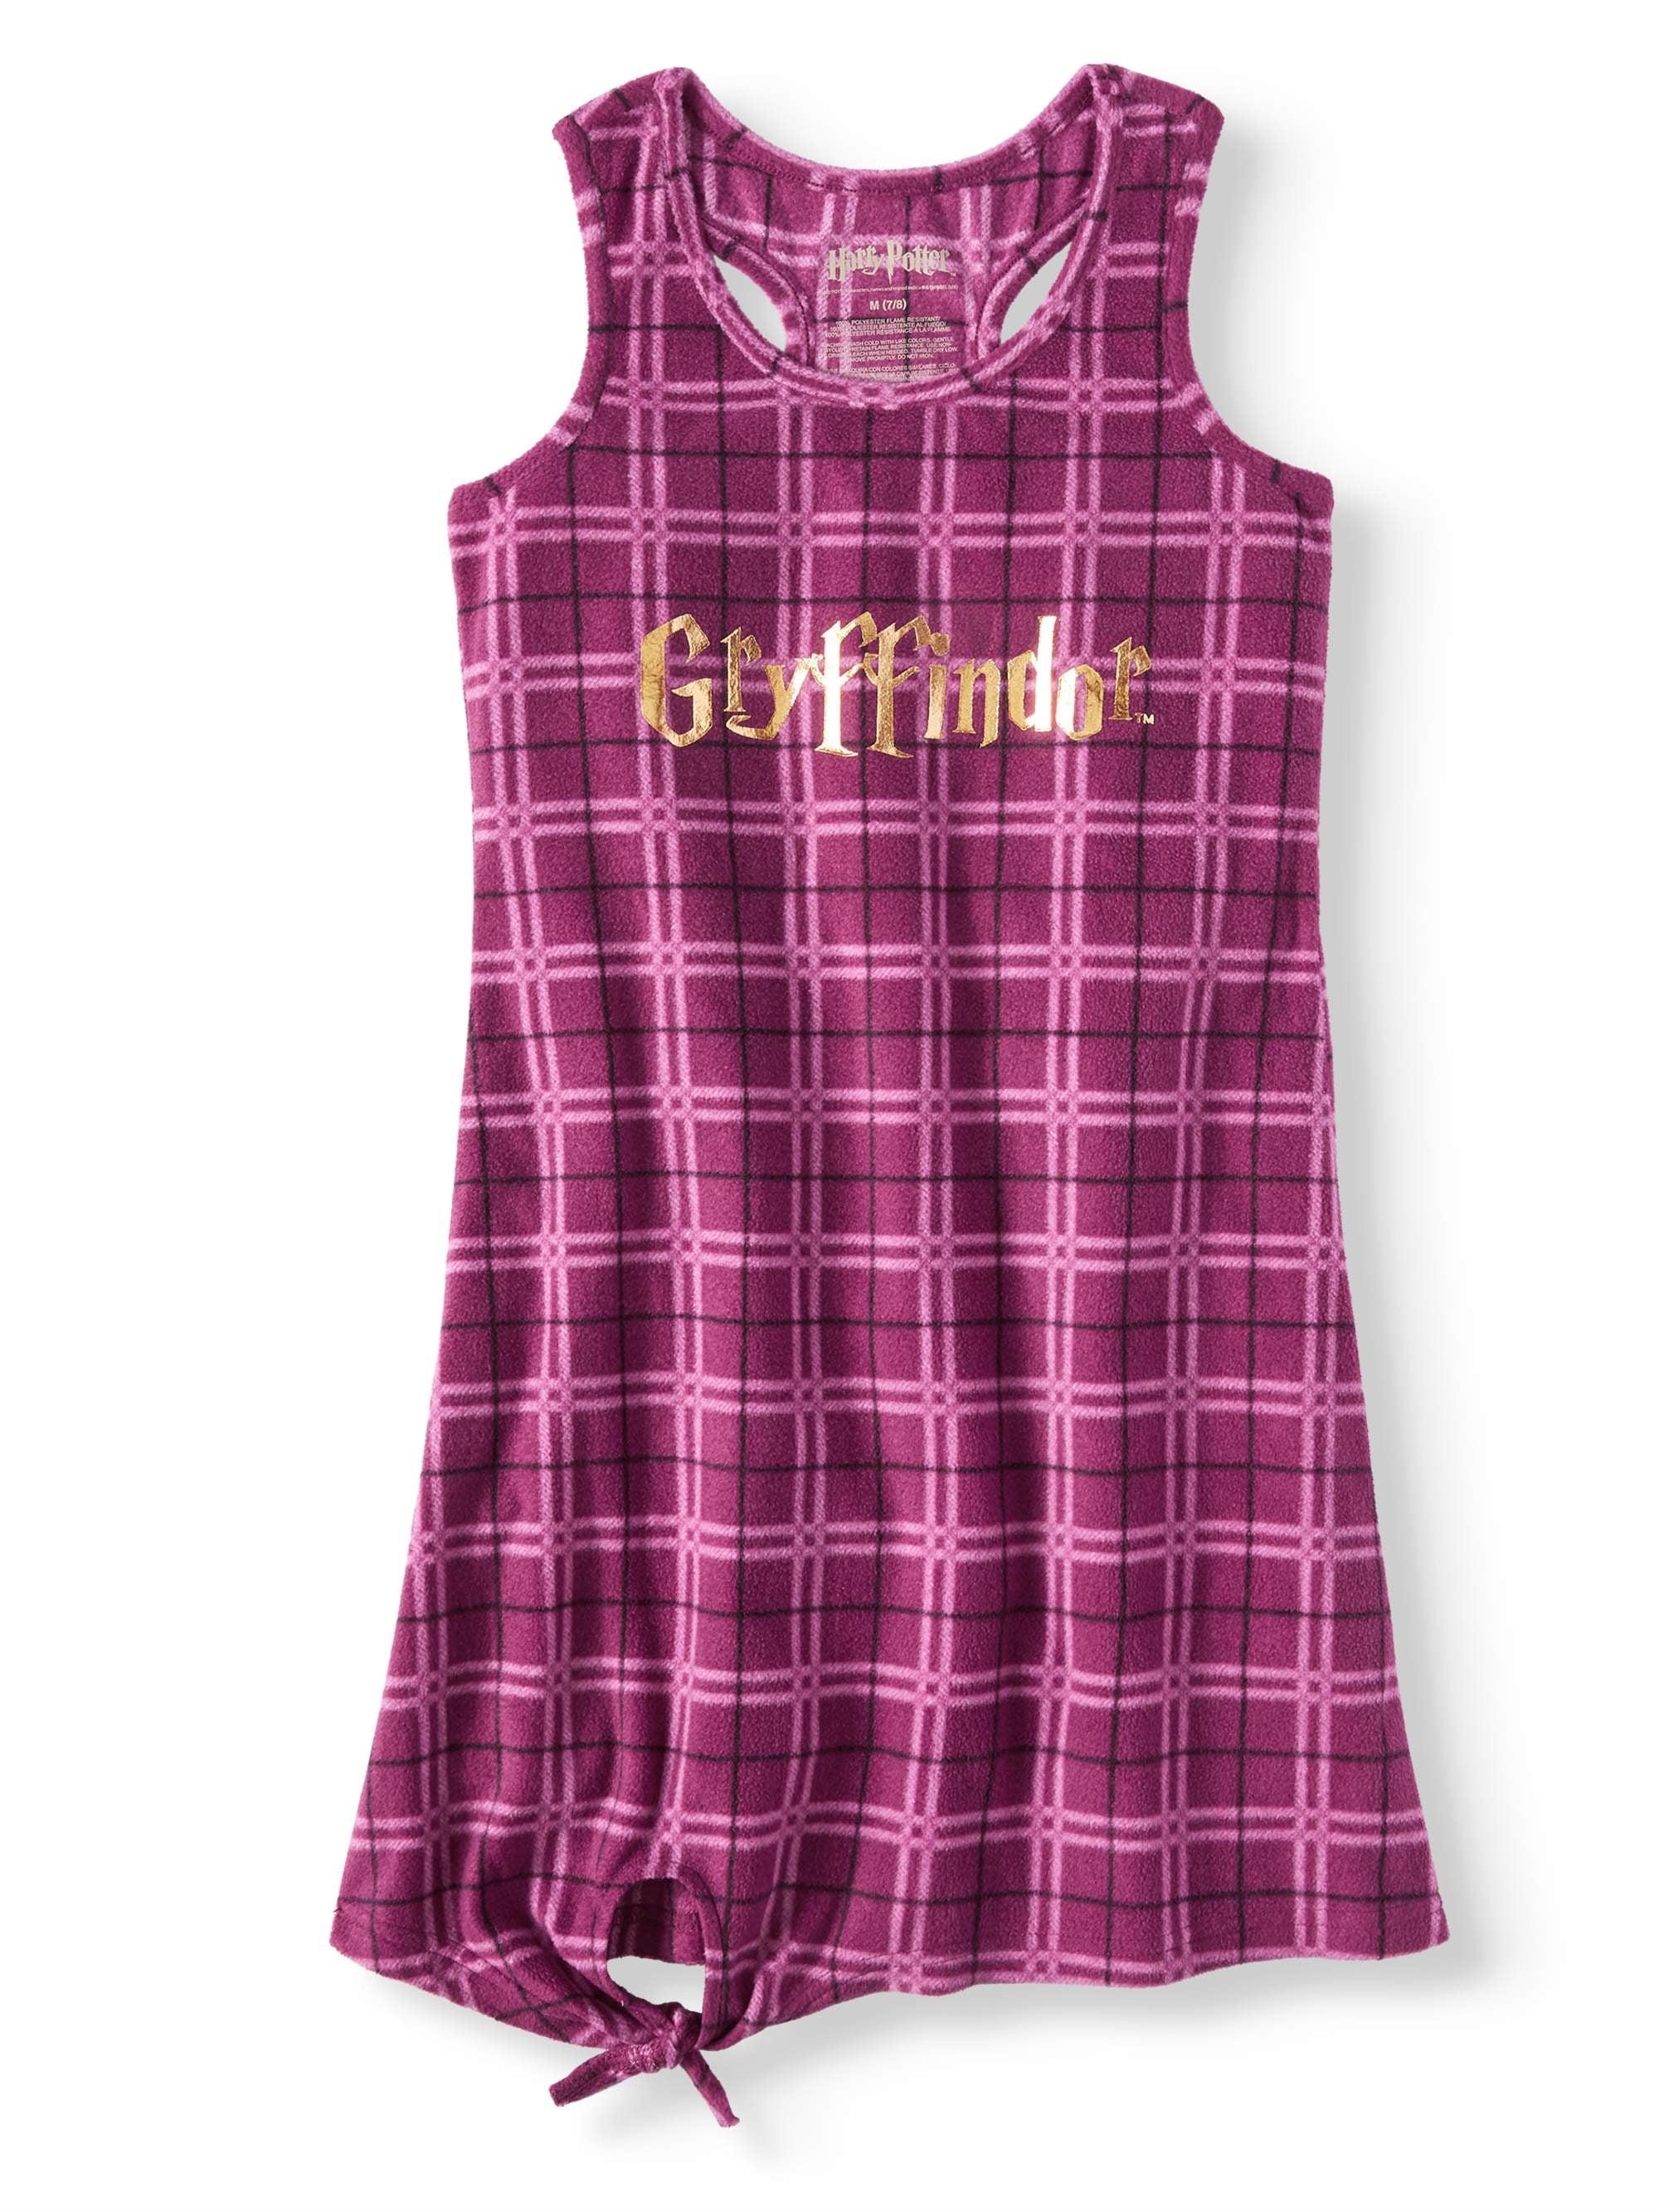 Harry Potter 'Gryffindor House' Racerback Pajama Nightgown Girls'